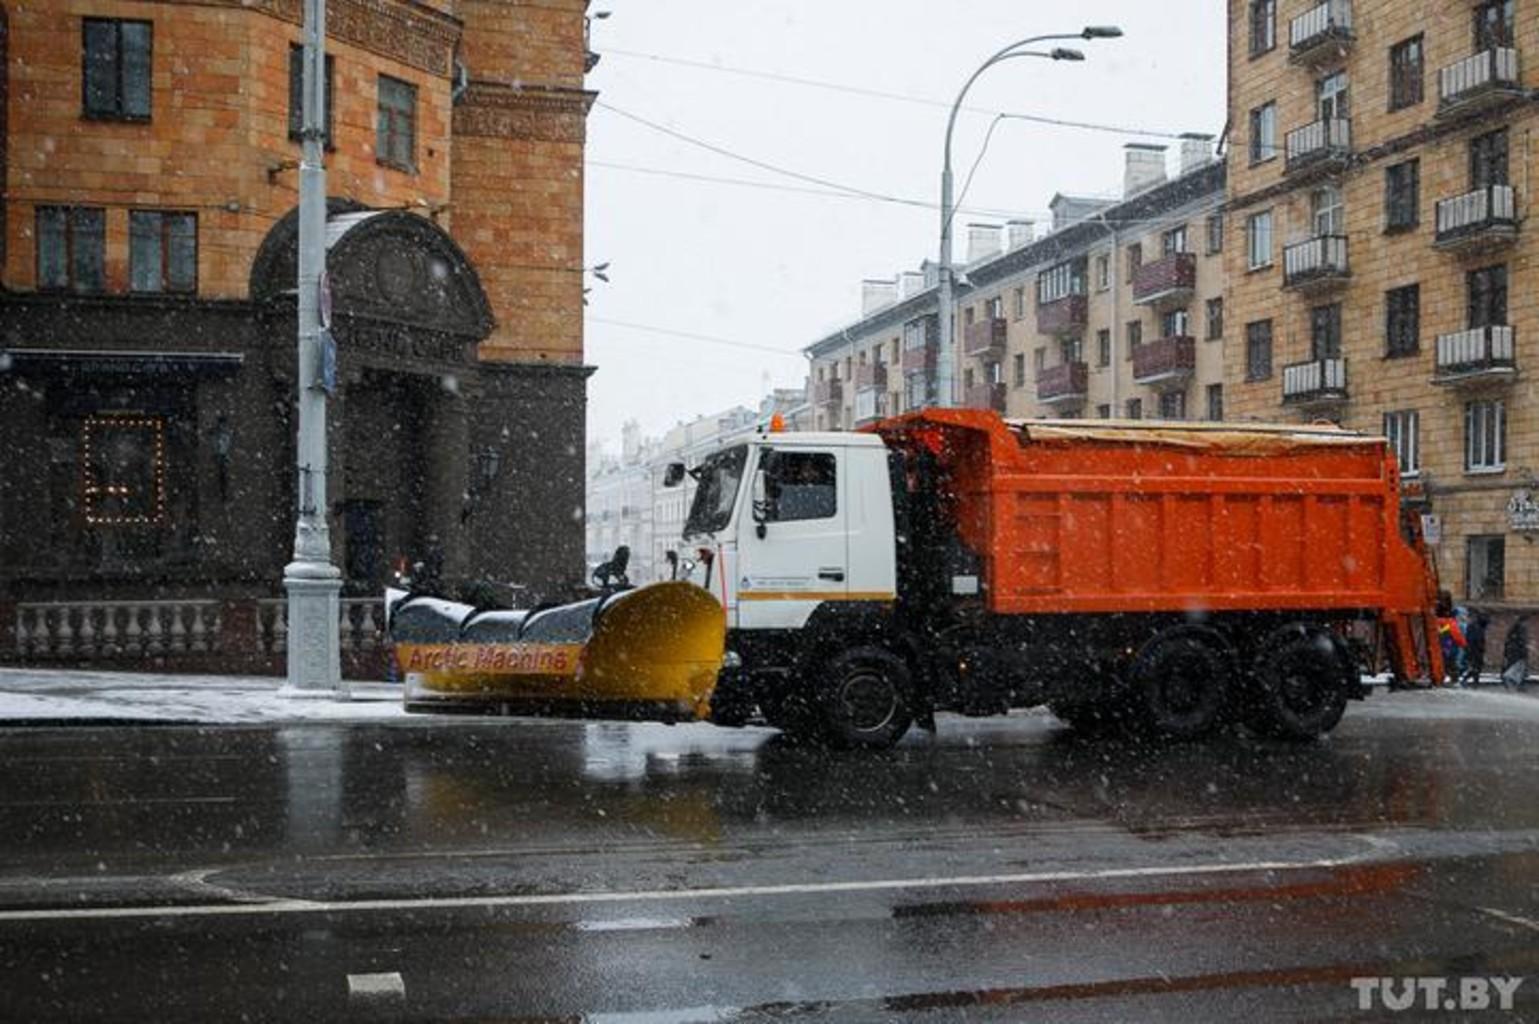 Sneg pogoda 20200129 shuk tutby phsl 3288